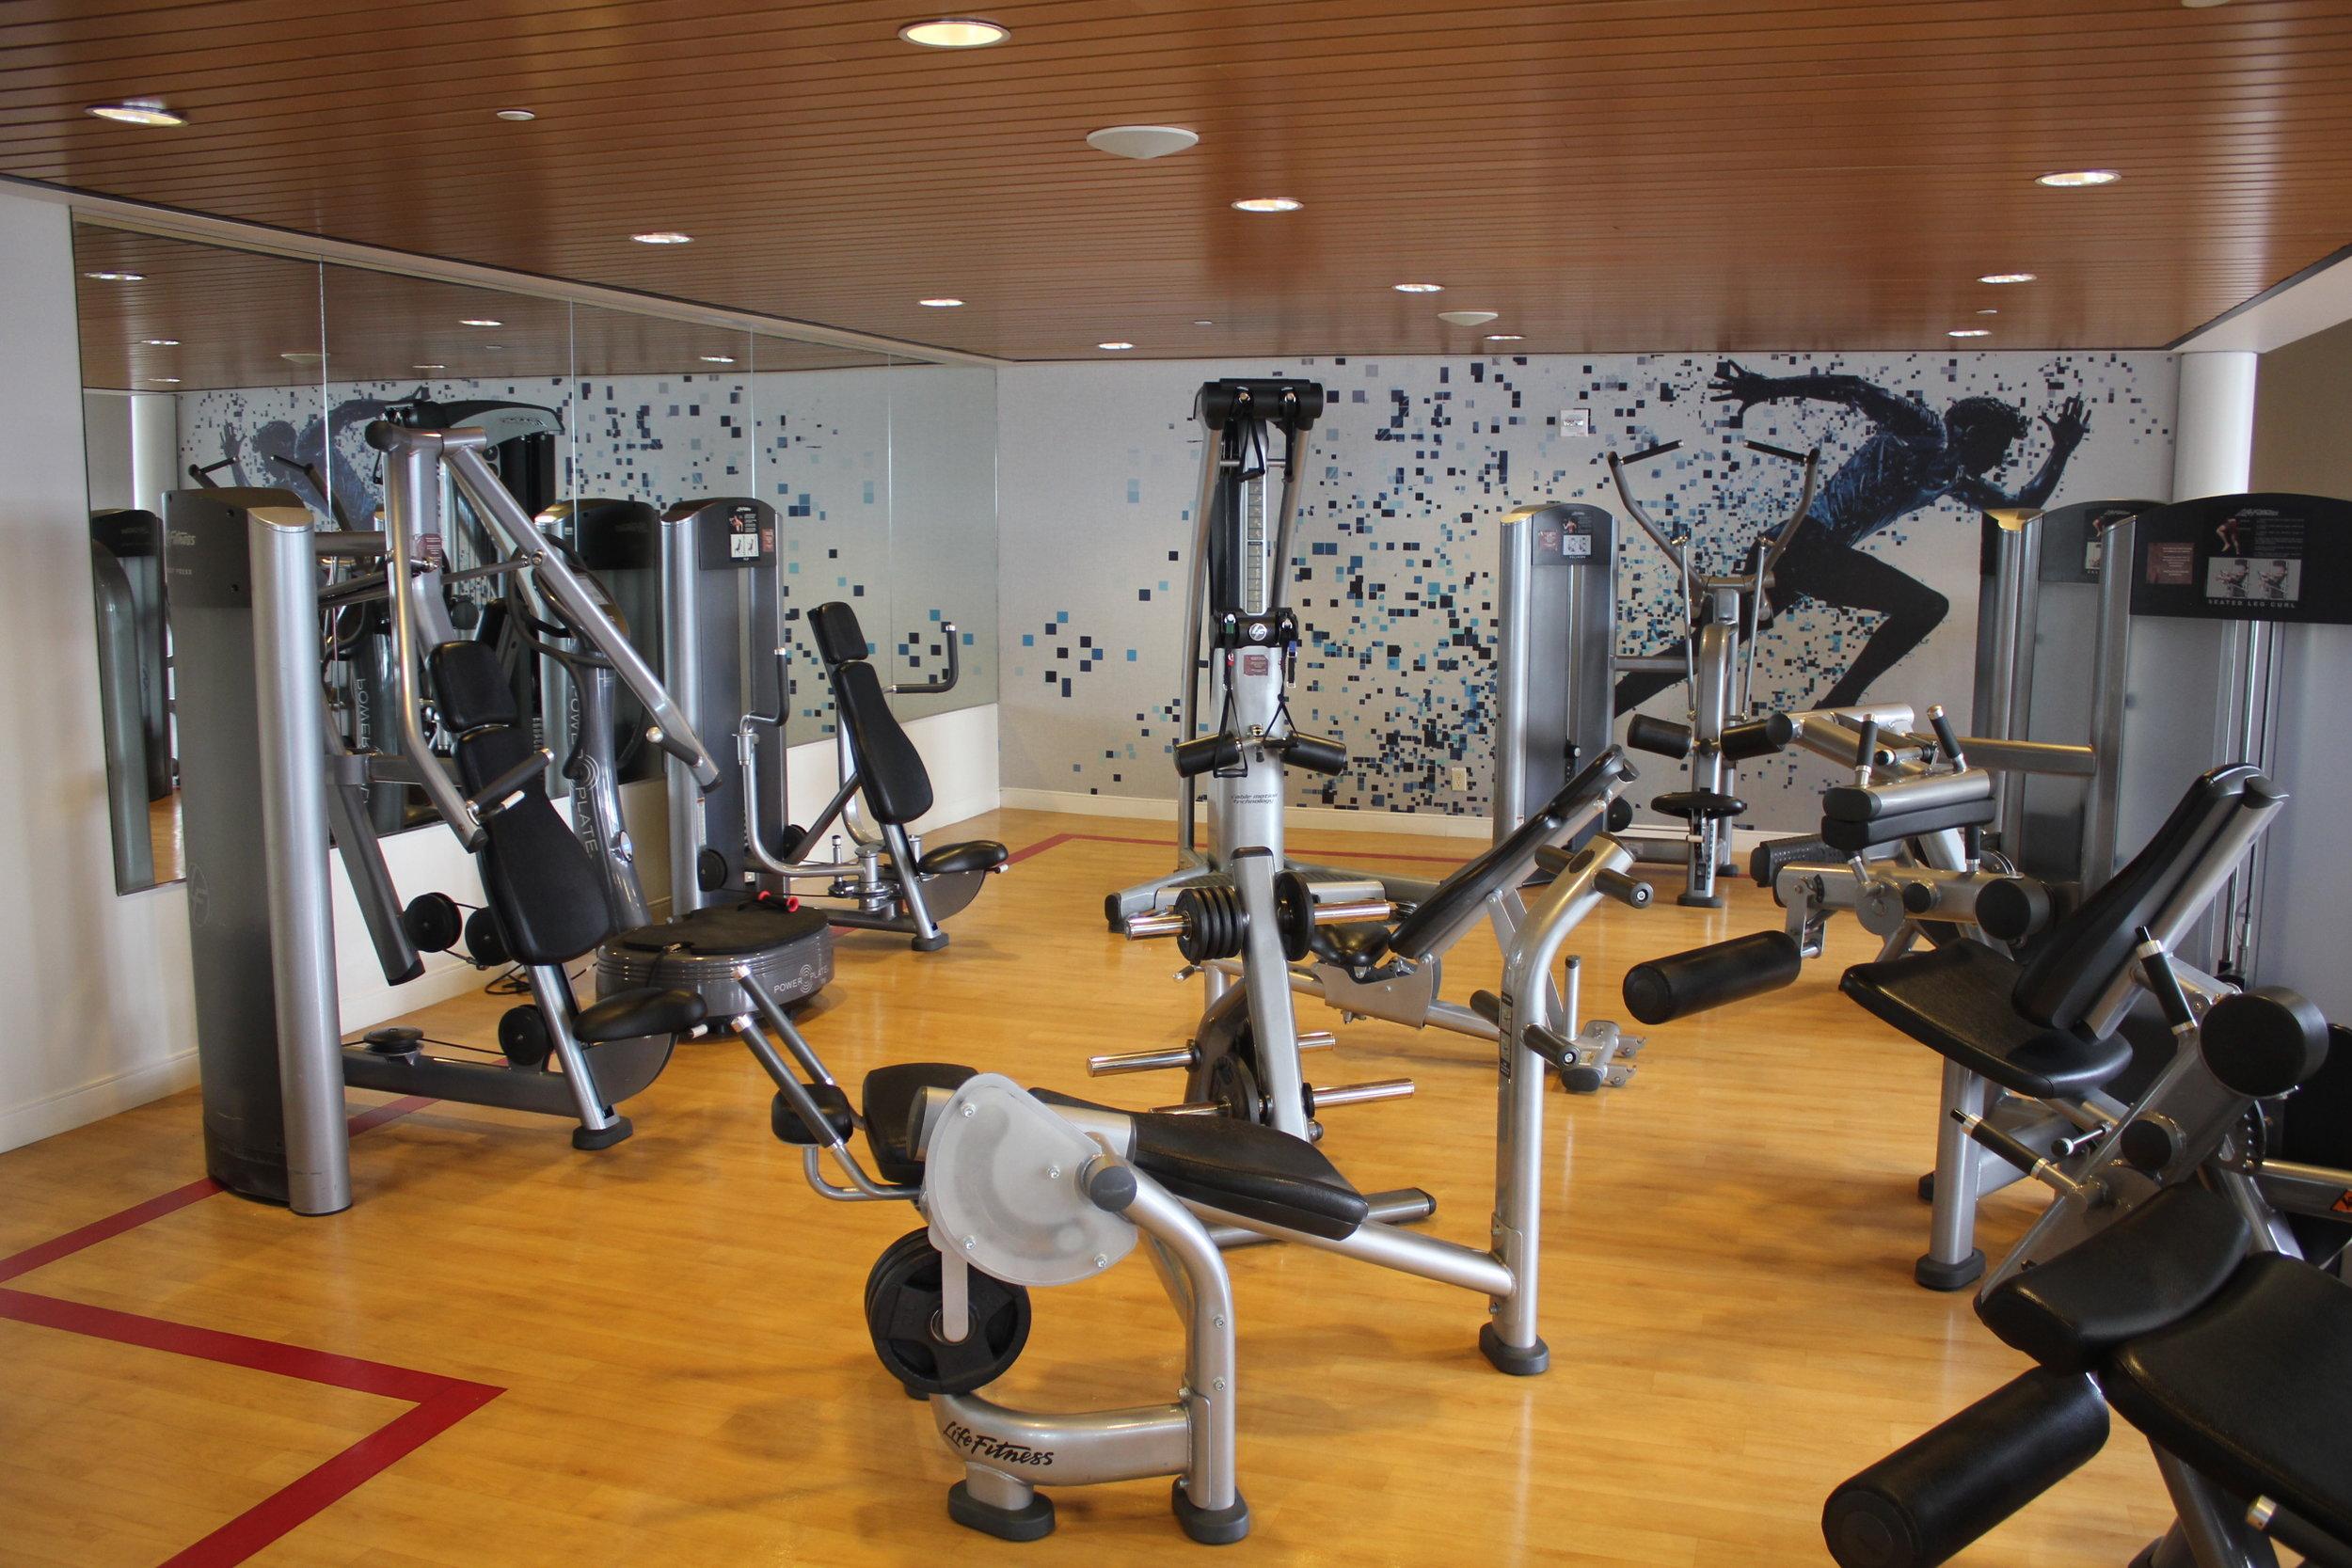 Sheraton Seattle – Fitness equipment